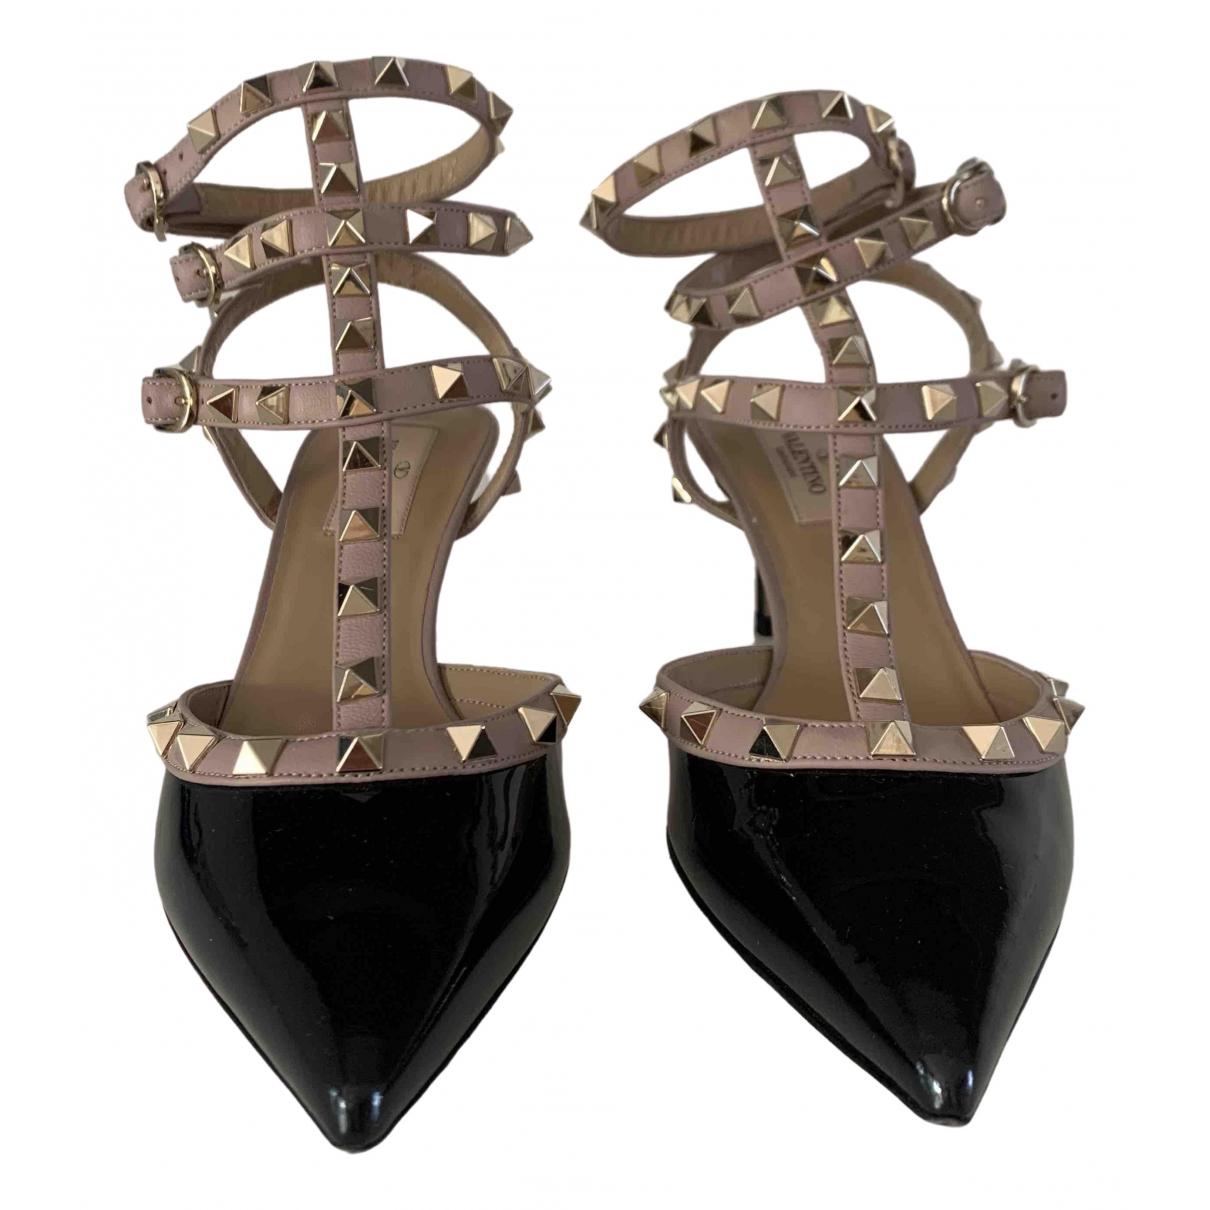 Valentino Garavani Rockstud Black Patent leather Heels for Women 37.5 IT